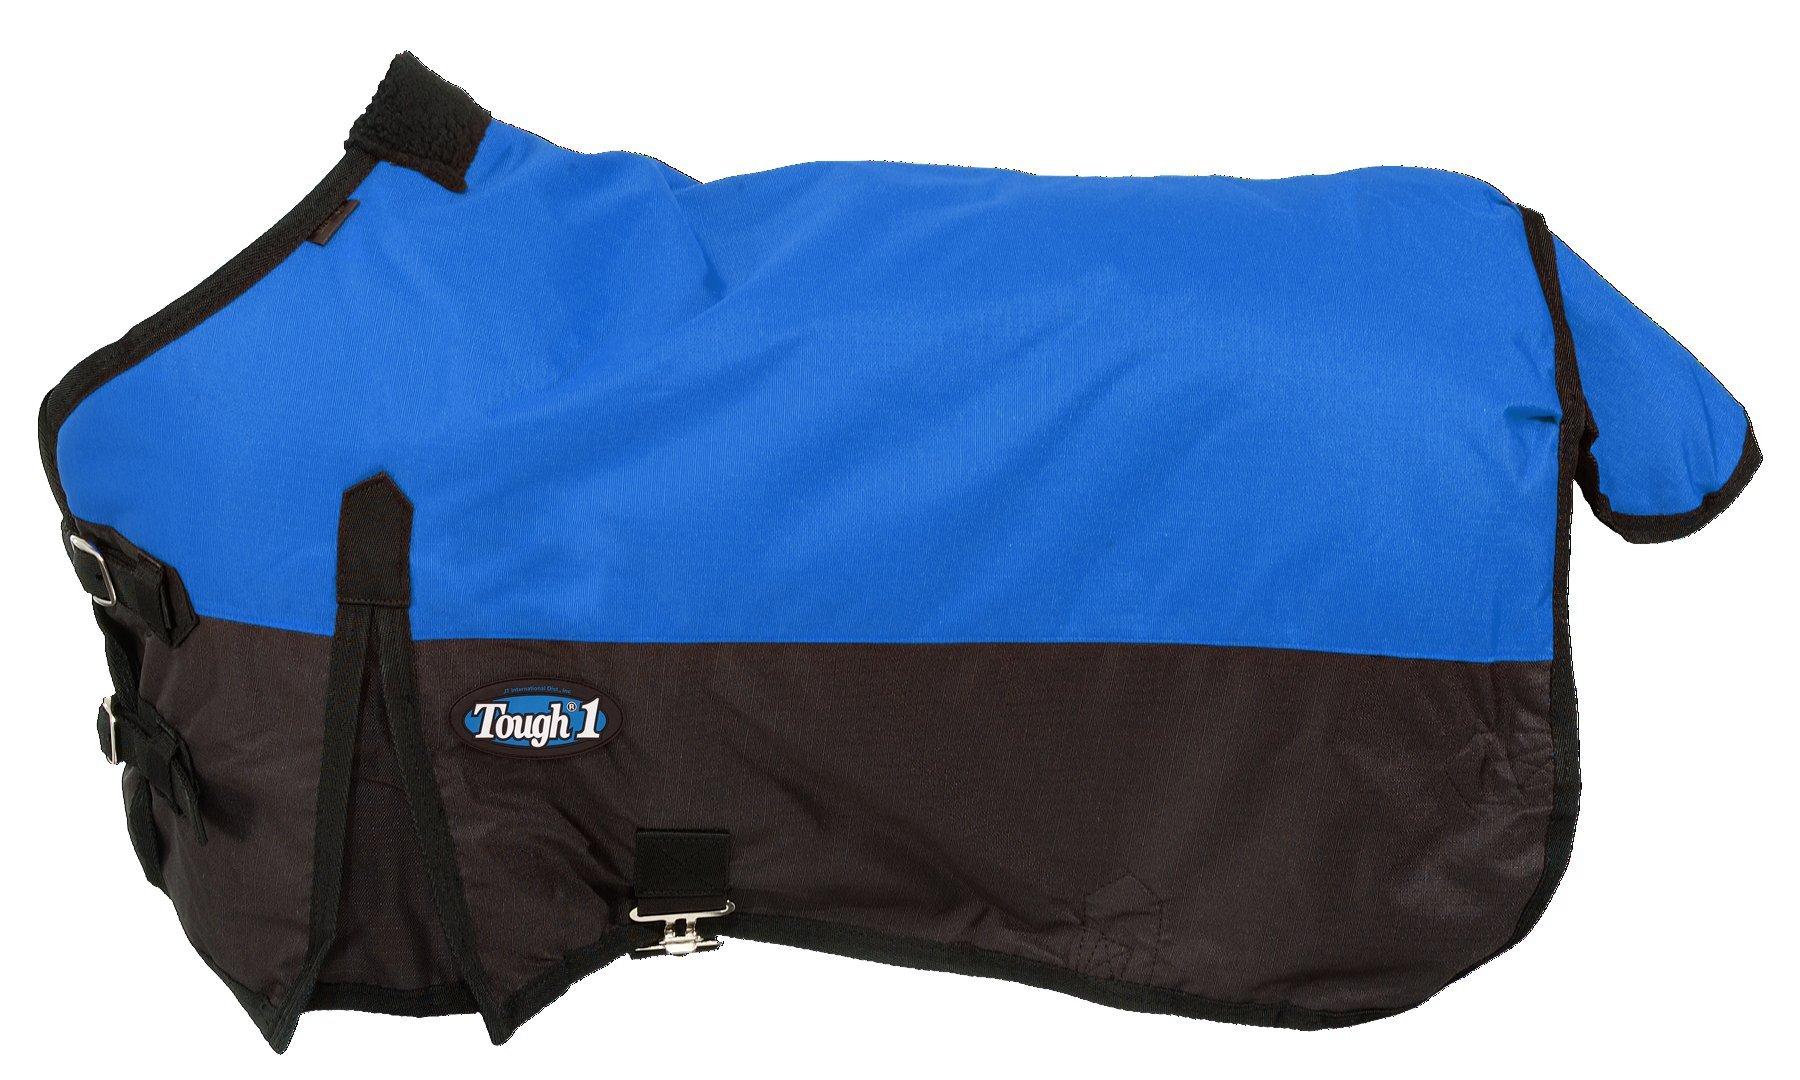 Tough 1 600D Waterproof Poly Miniature Turnout Blanket, Royal Blue, 50'' by Tough 1